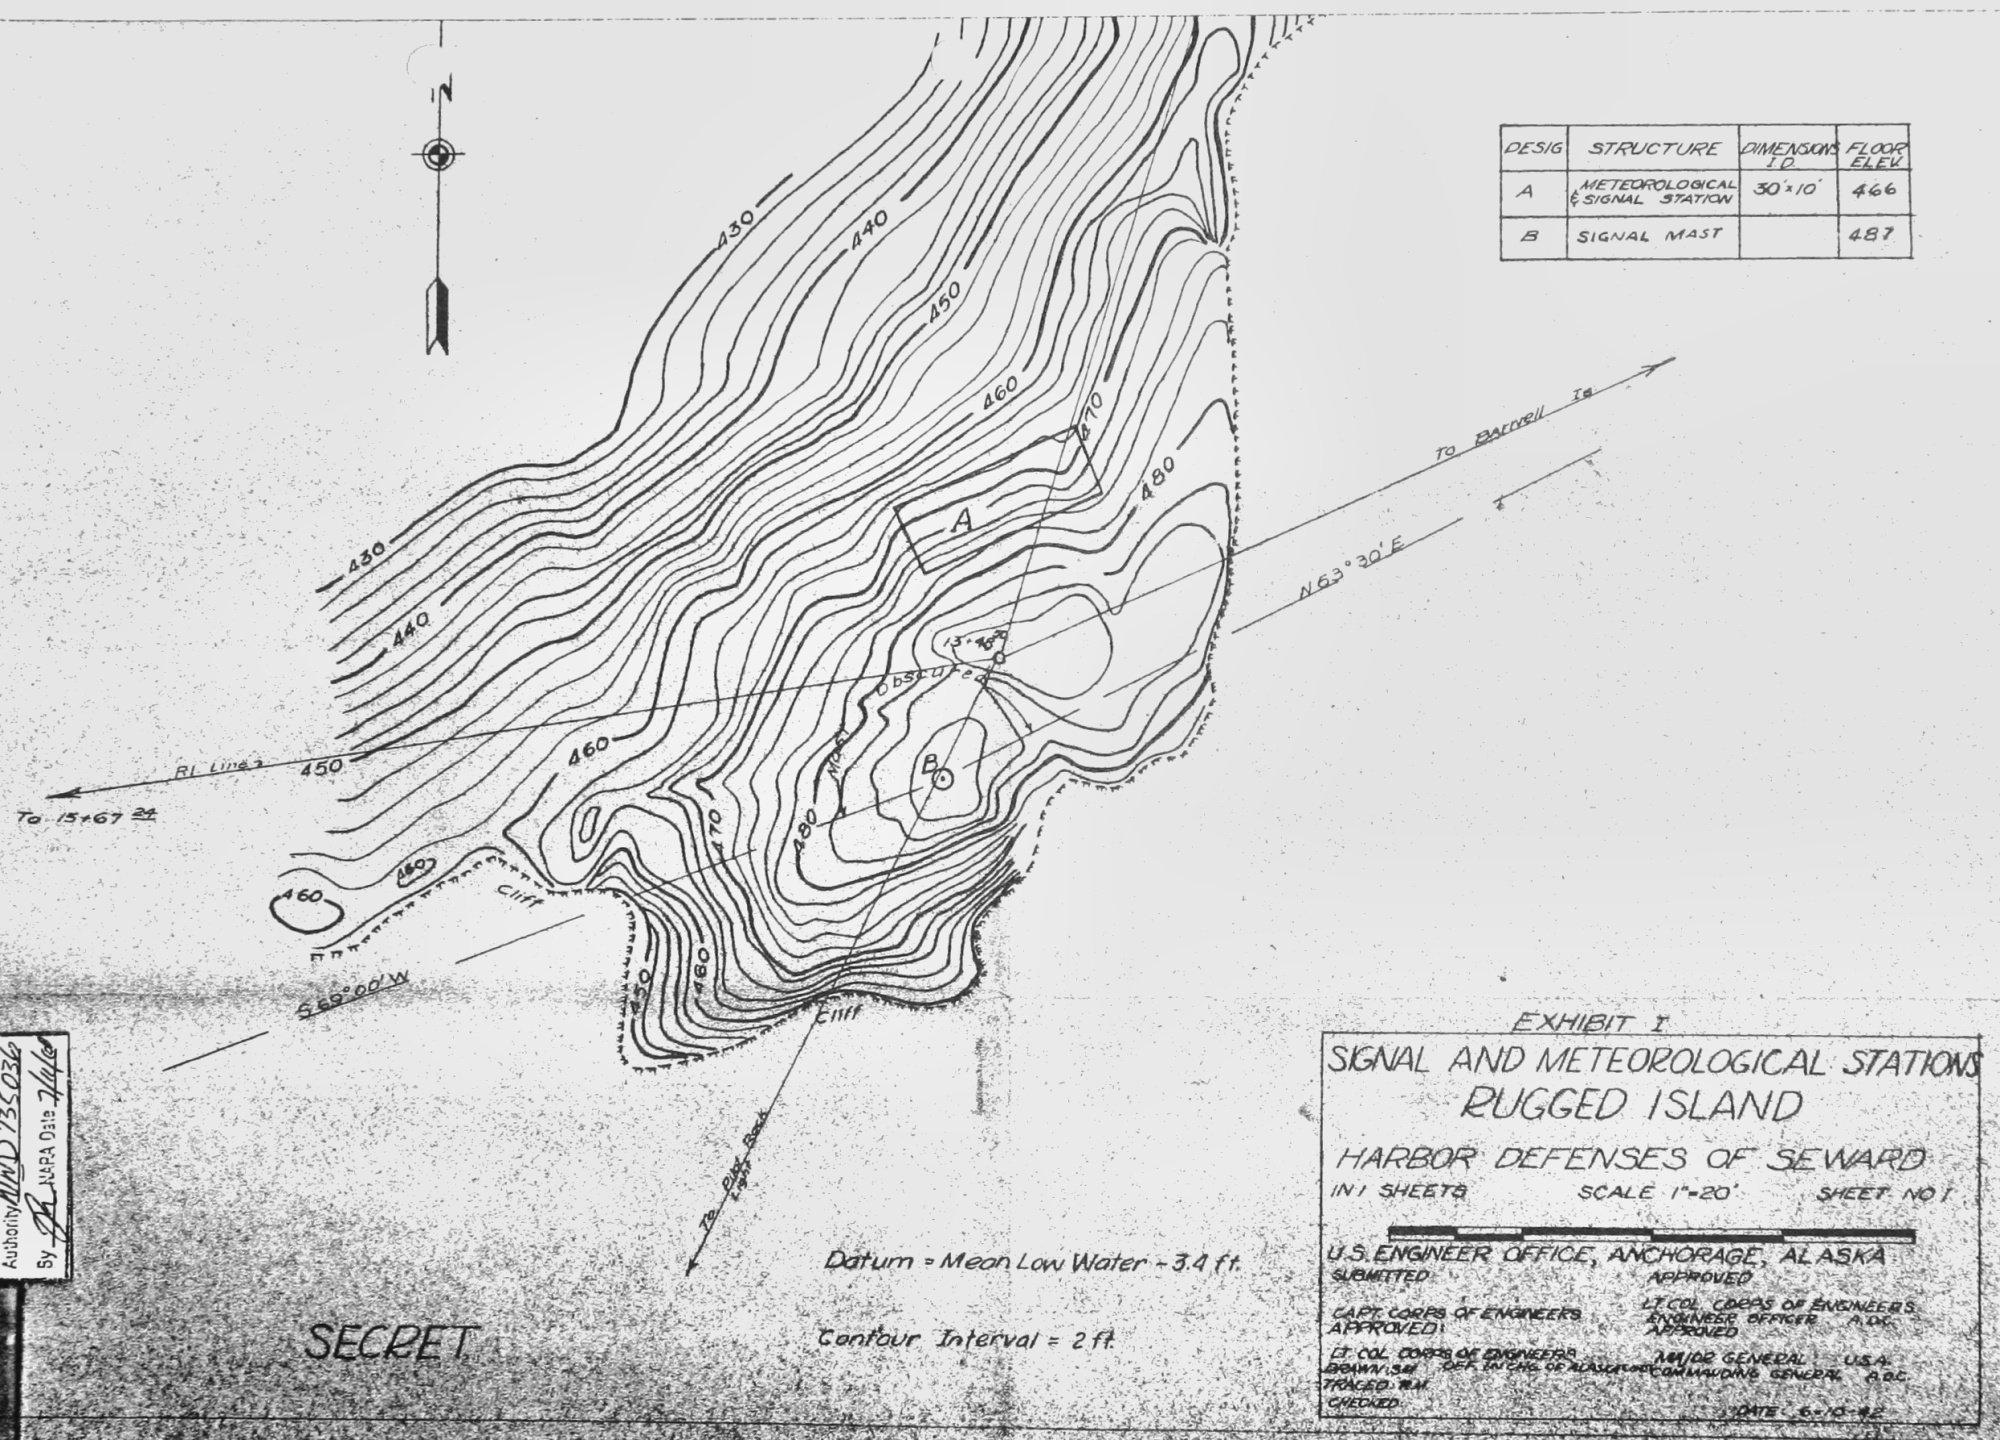 Seacoast Defense Documents